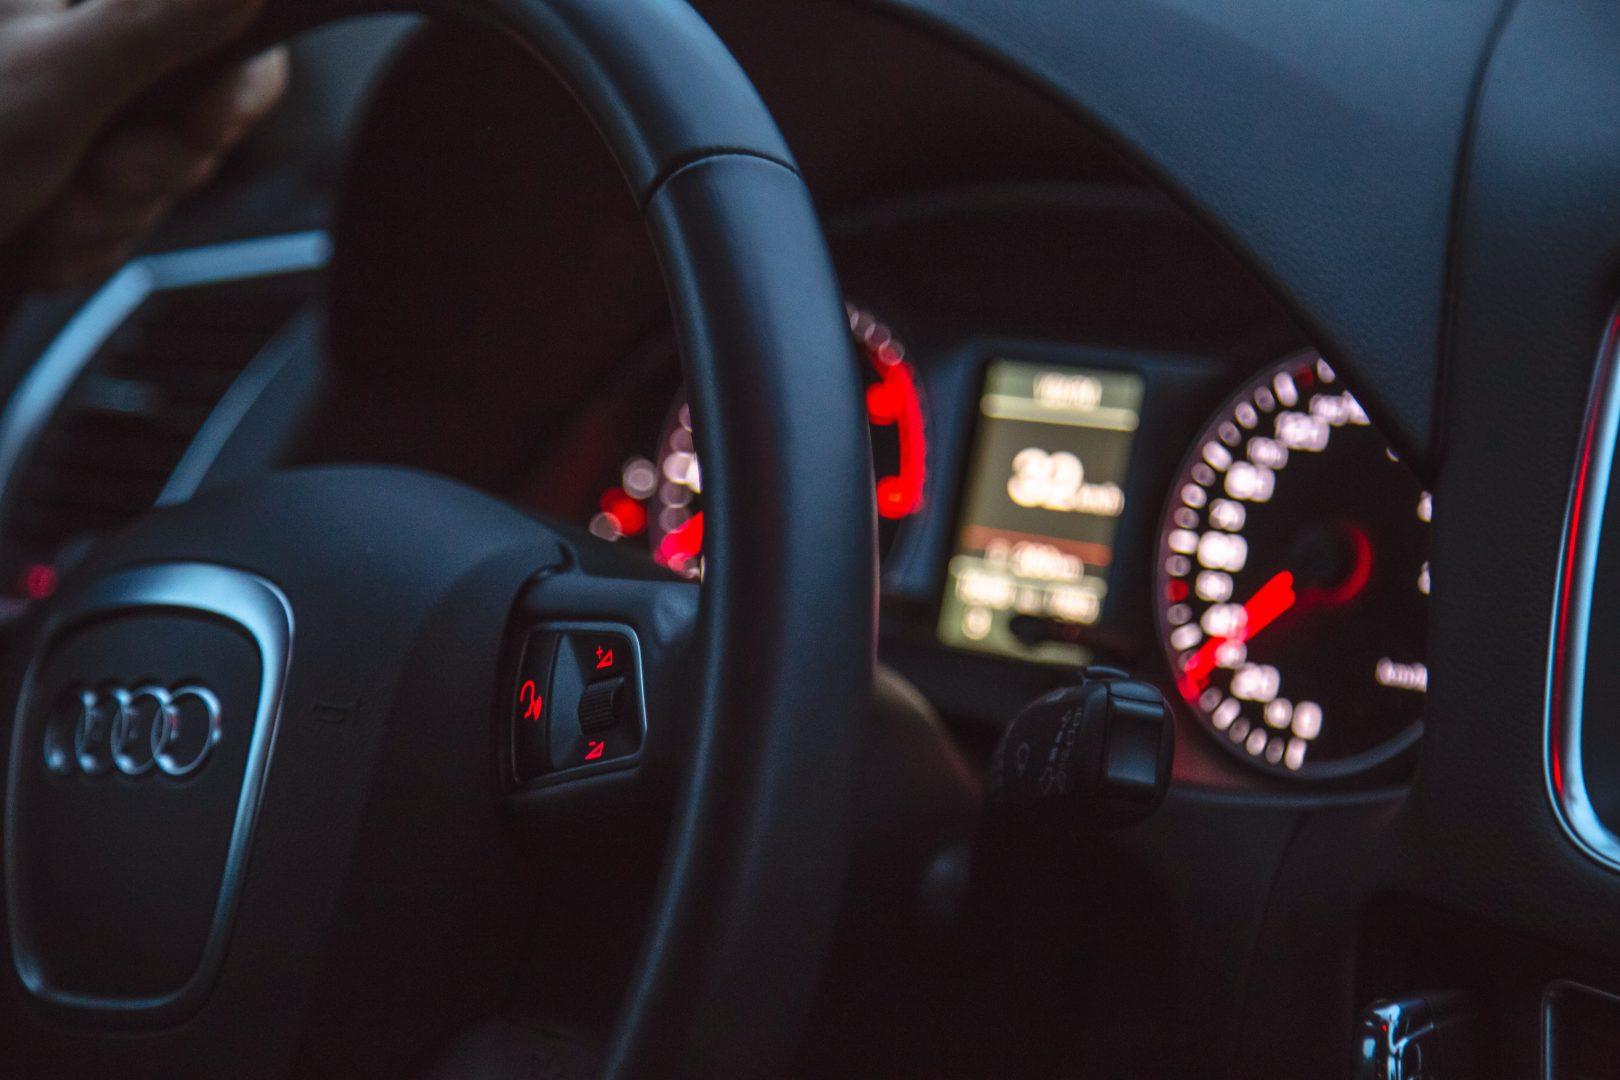 interior of audi dashboard